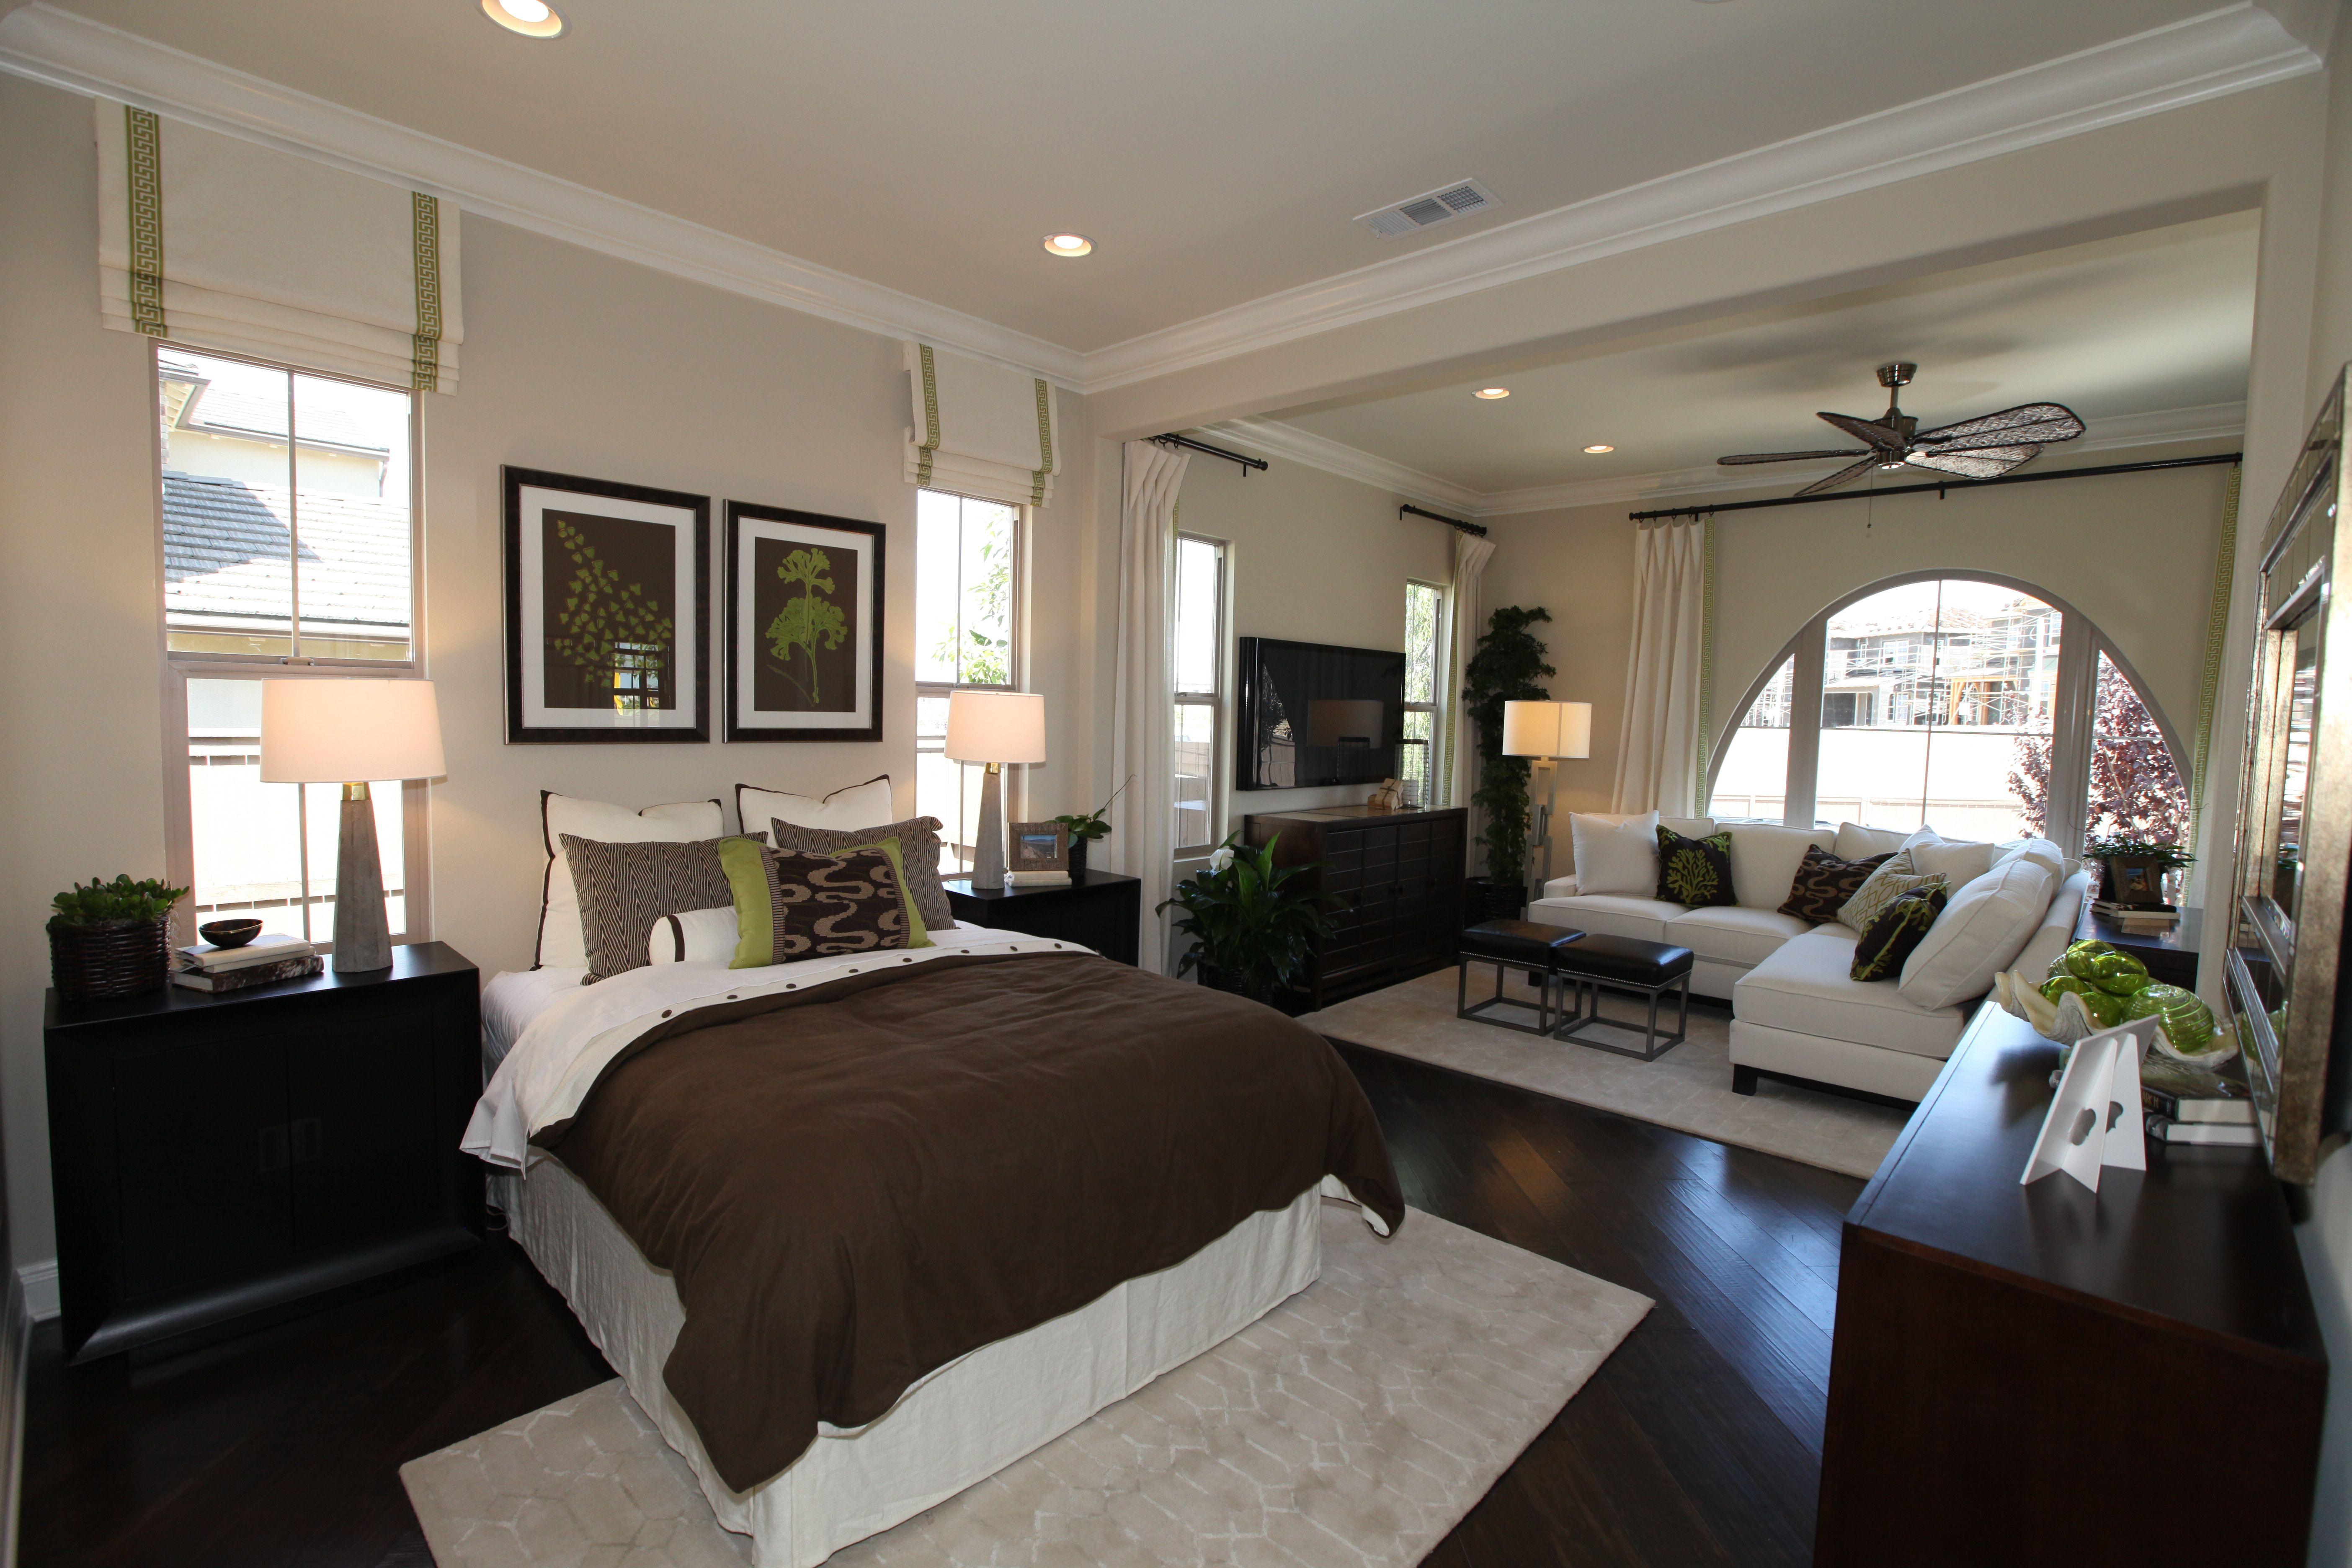 Neighborhoods Del Sur Living In Law Suite Mother In Law Cottage Luxurious Bedrooms